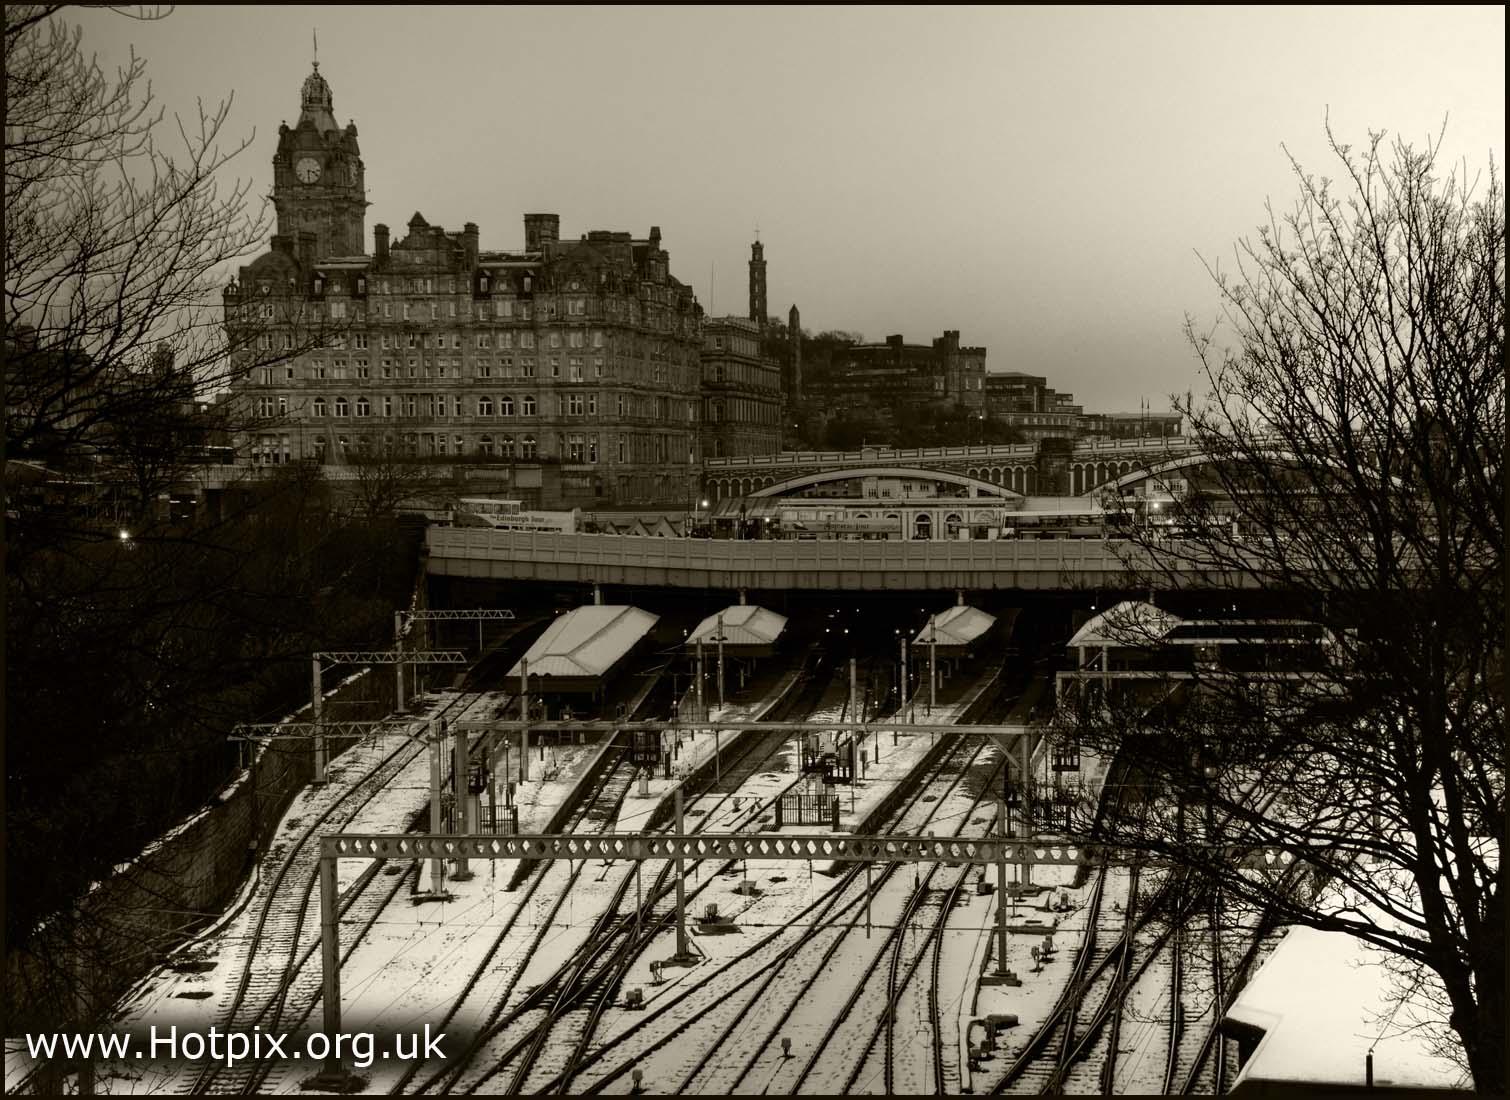 rail,way,railway,mainline,main,line,station,british,edinburgh,waveley,waverley,wavey,davey,snow,december,midlothian,scotland,capital,city,sepia,b/w,black,white,lines,tracks,hotel,2009,xmas,christmas,tonysmith,tony,smith,hotpics,hotpic,hotpick,hotpicks,building,buildings,built,architecture,edinbrugh,hotpix!,Edinburg,#tonysmithhotpix,edimburgh